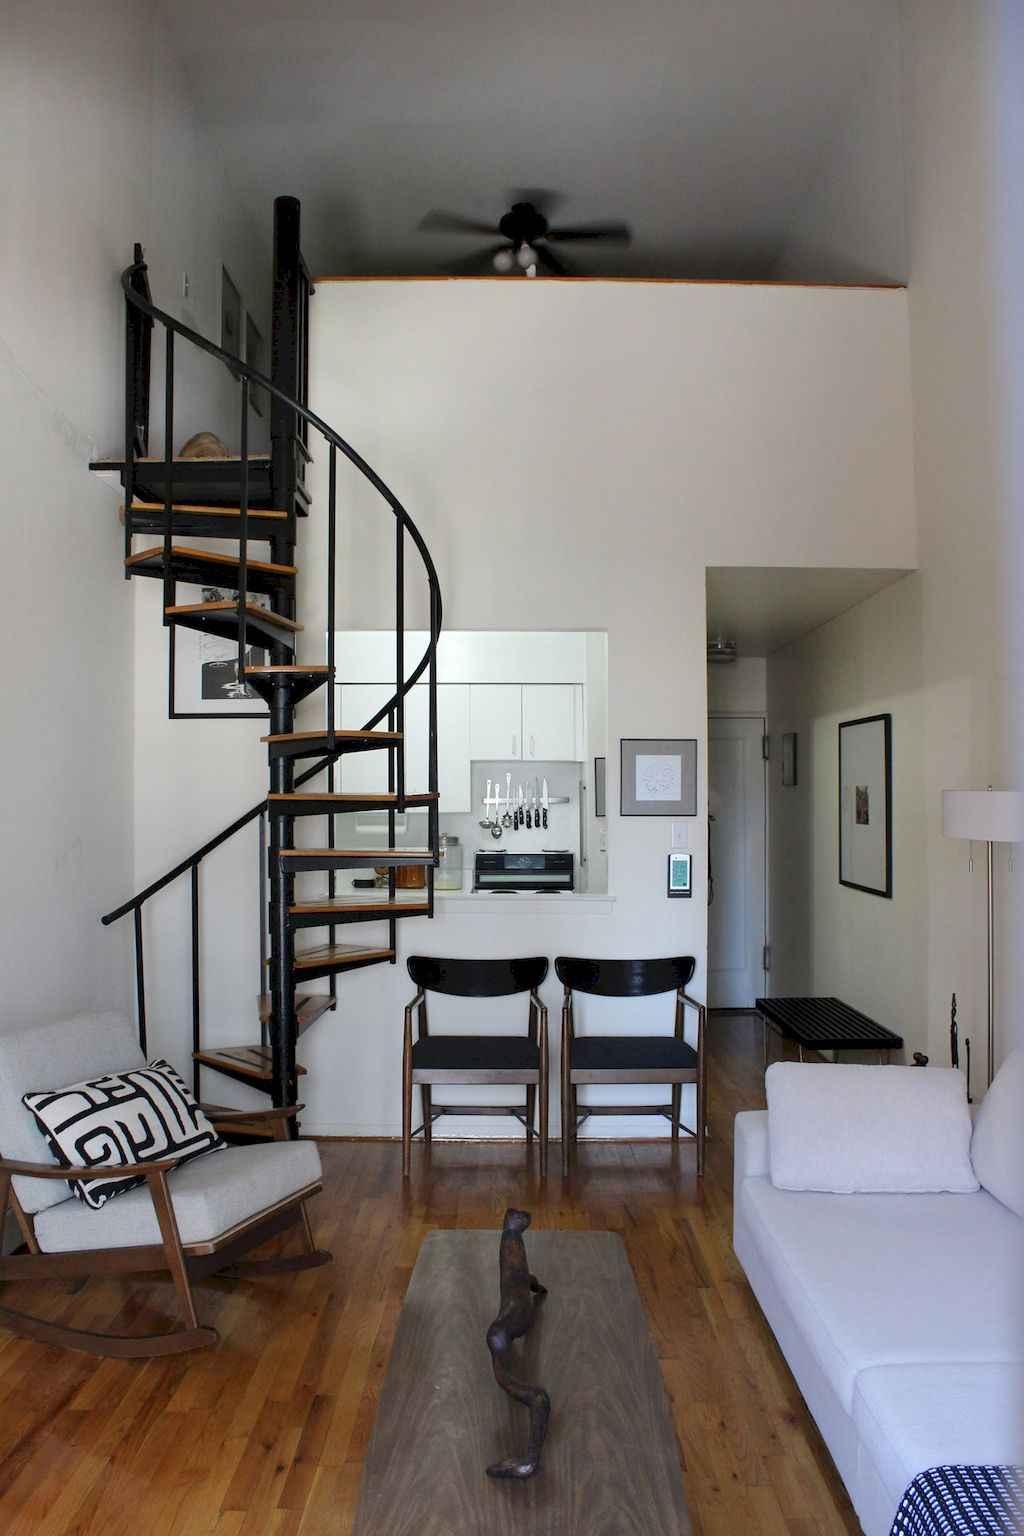 Cool creative loft apartment decorating ideas (13)